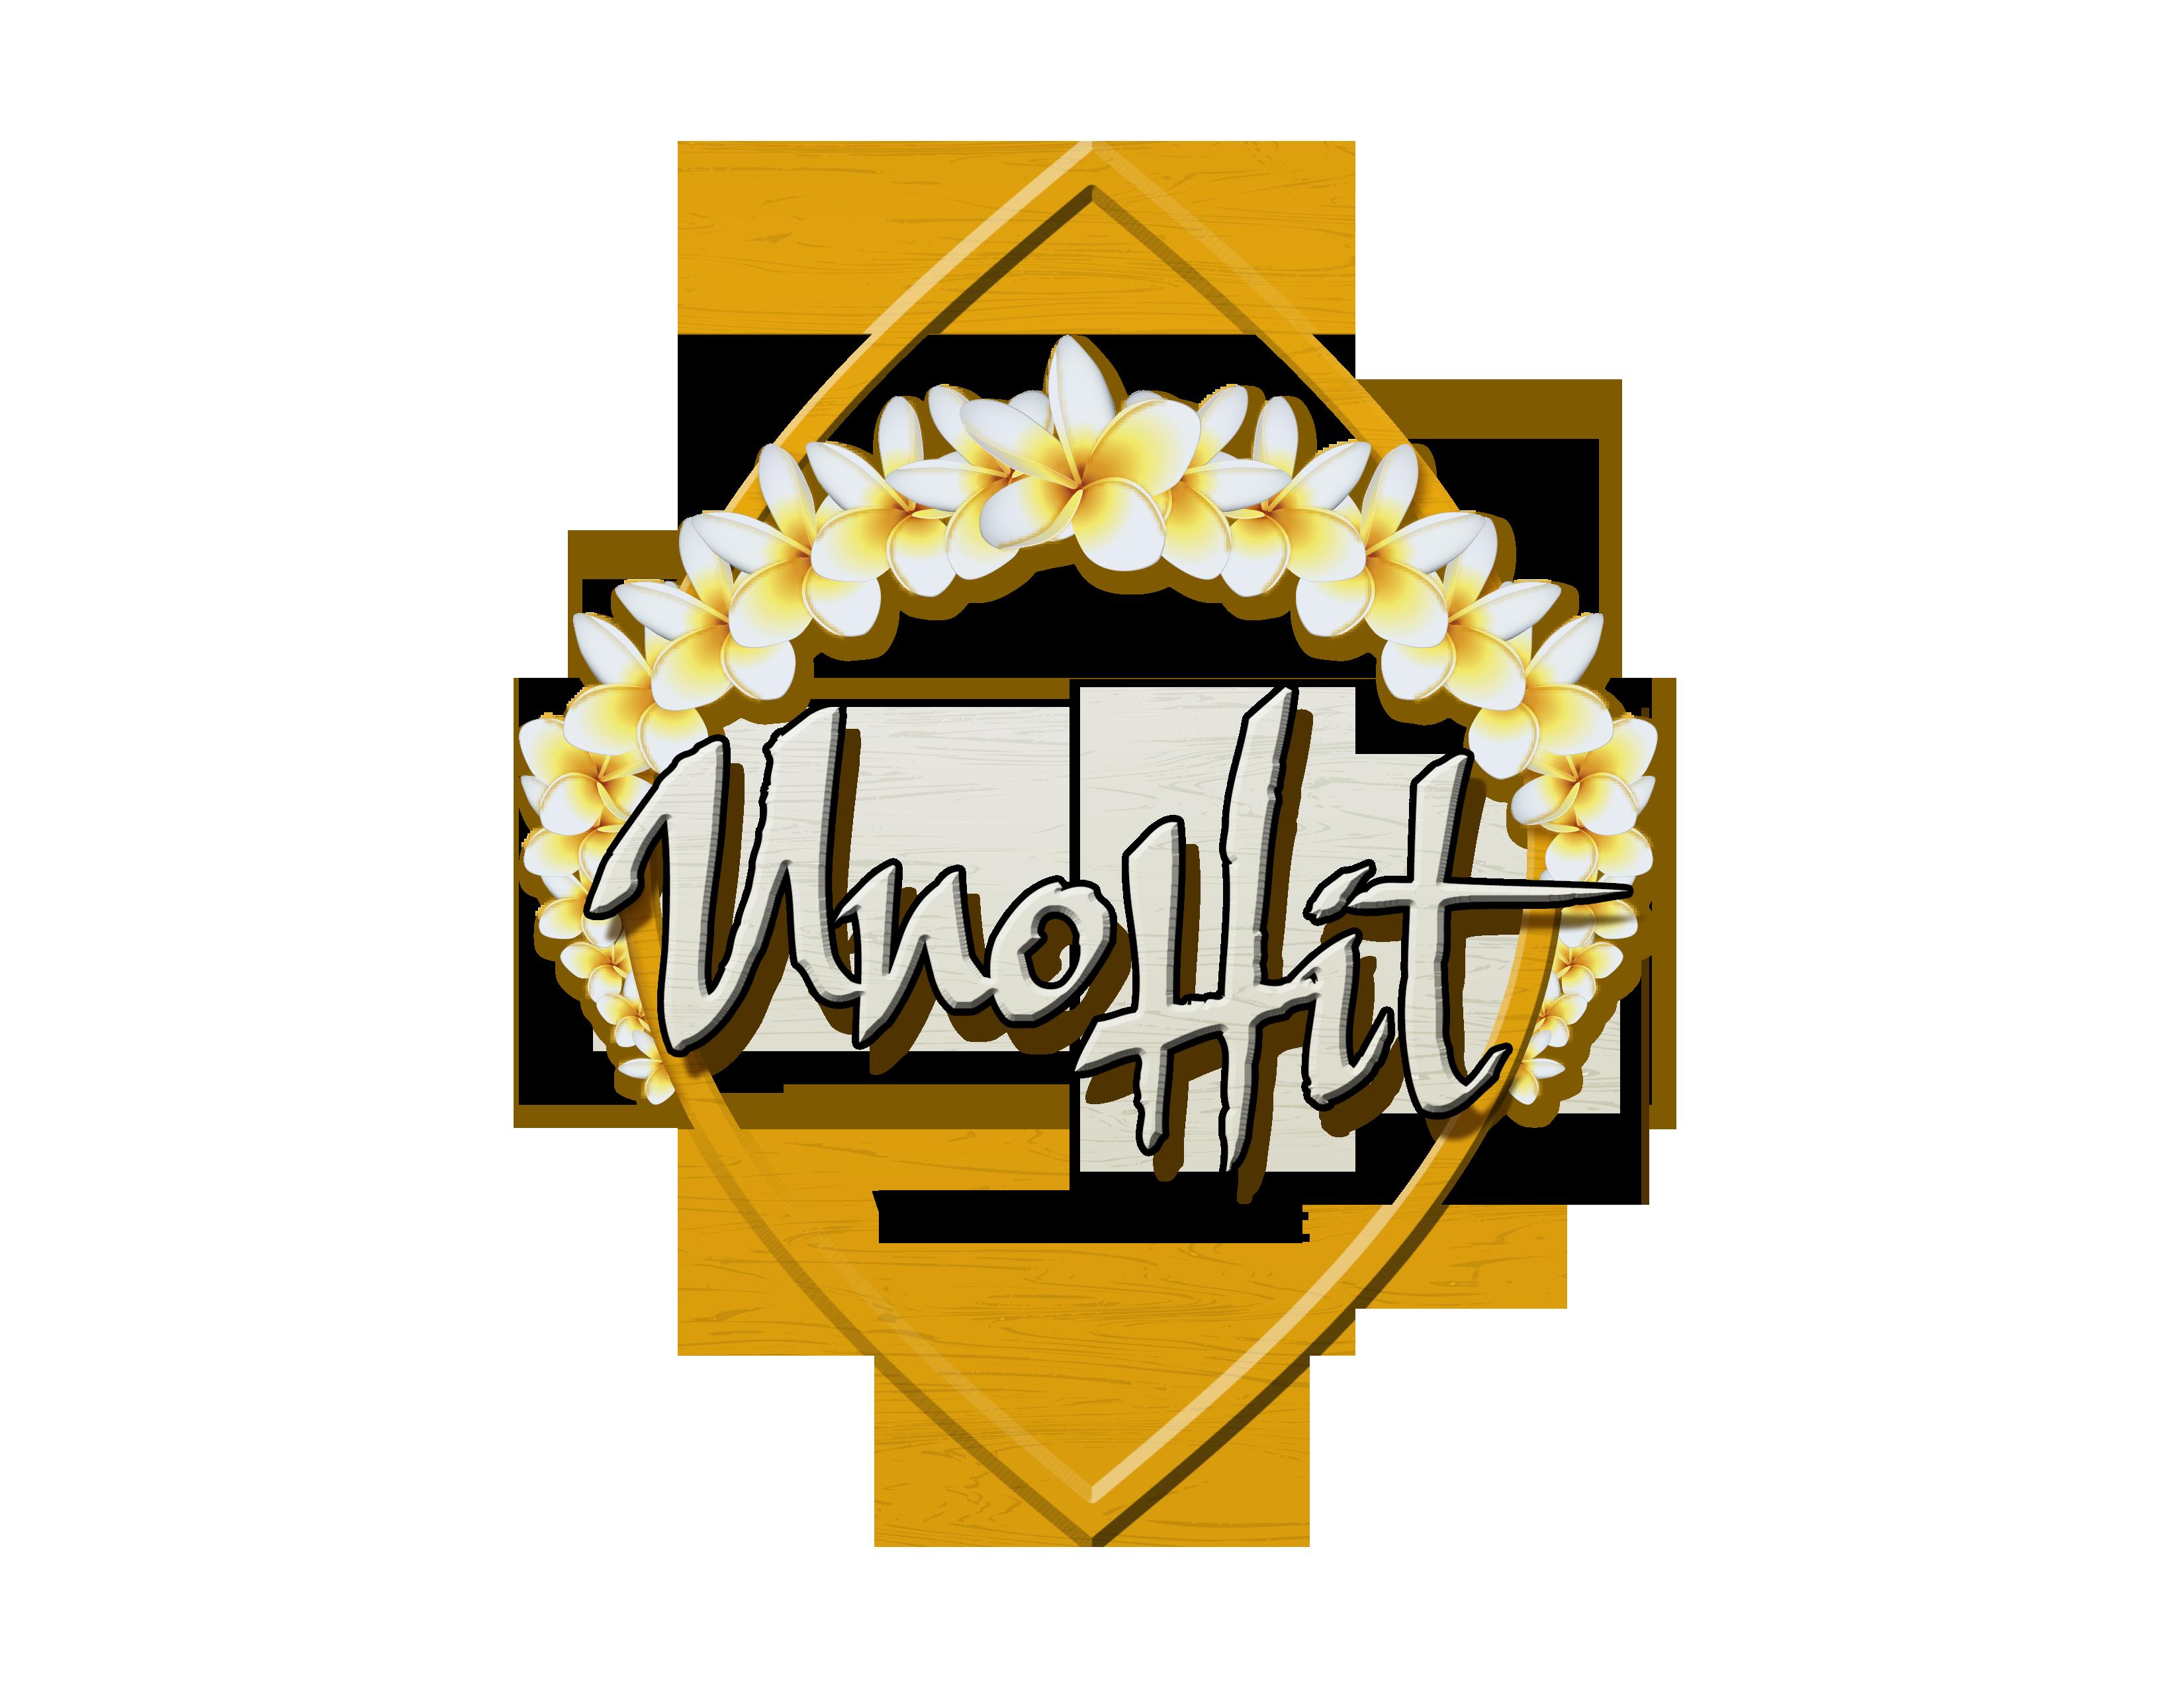 www.UNOHIT.org